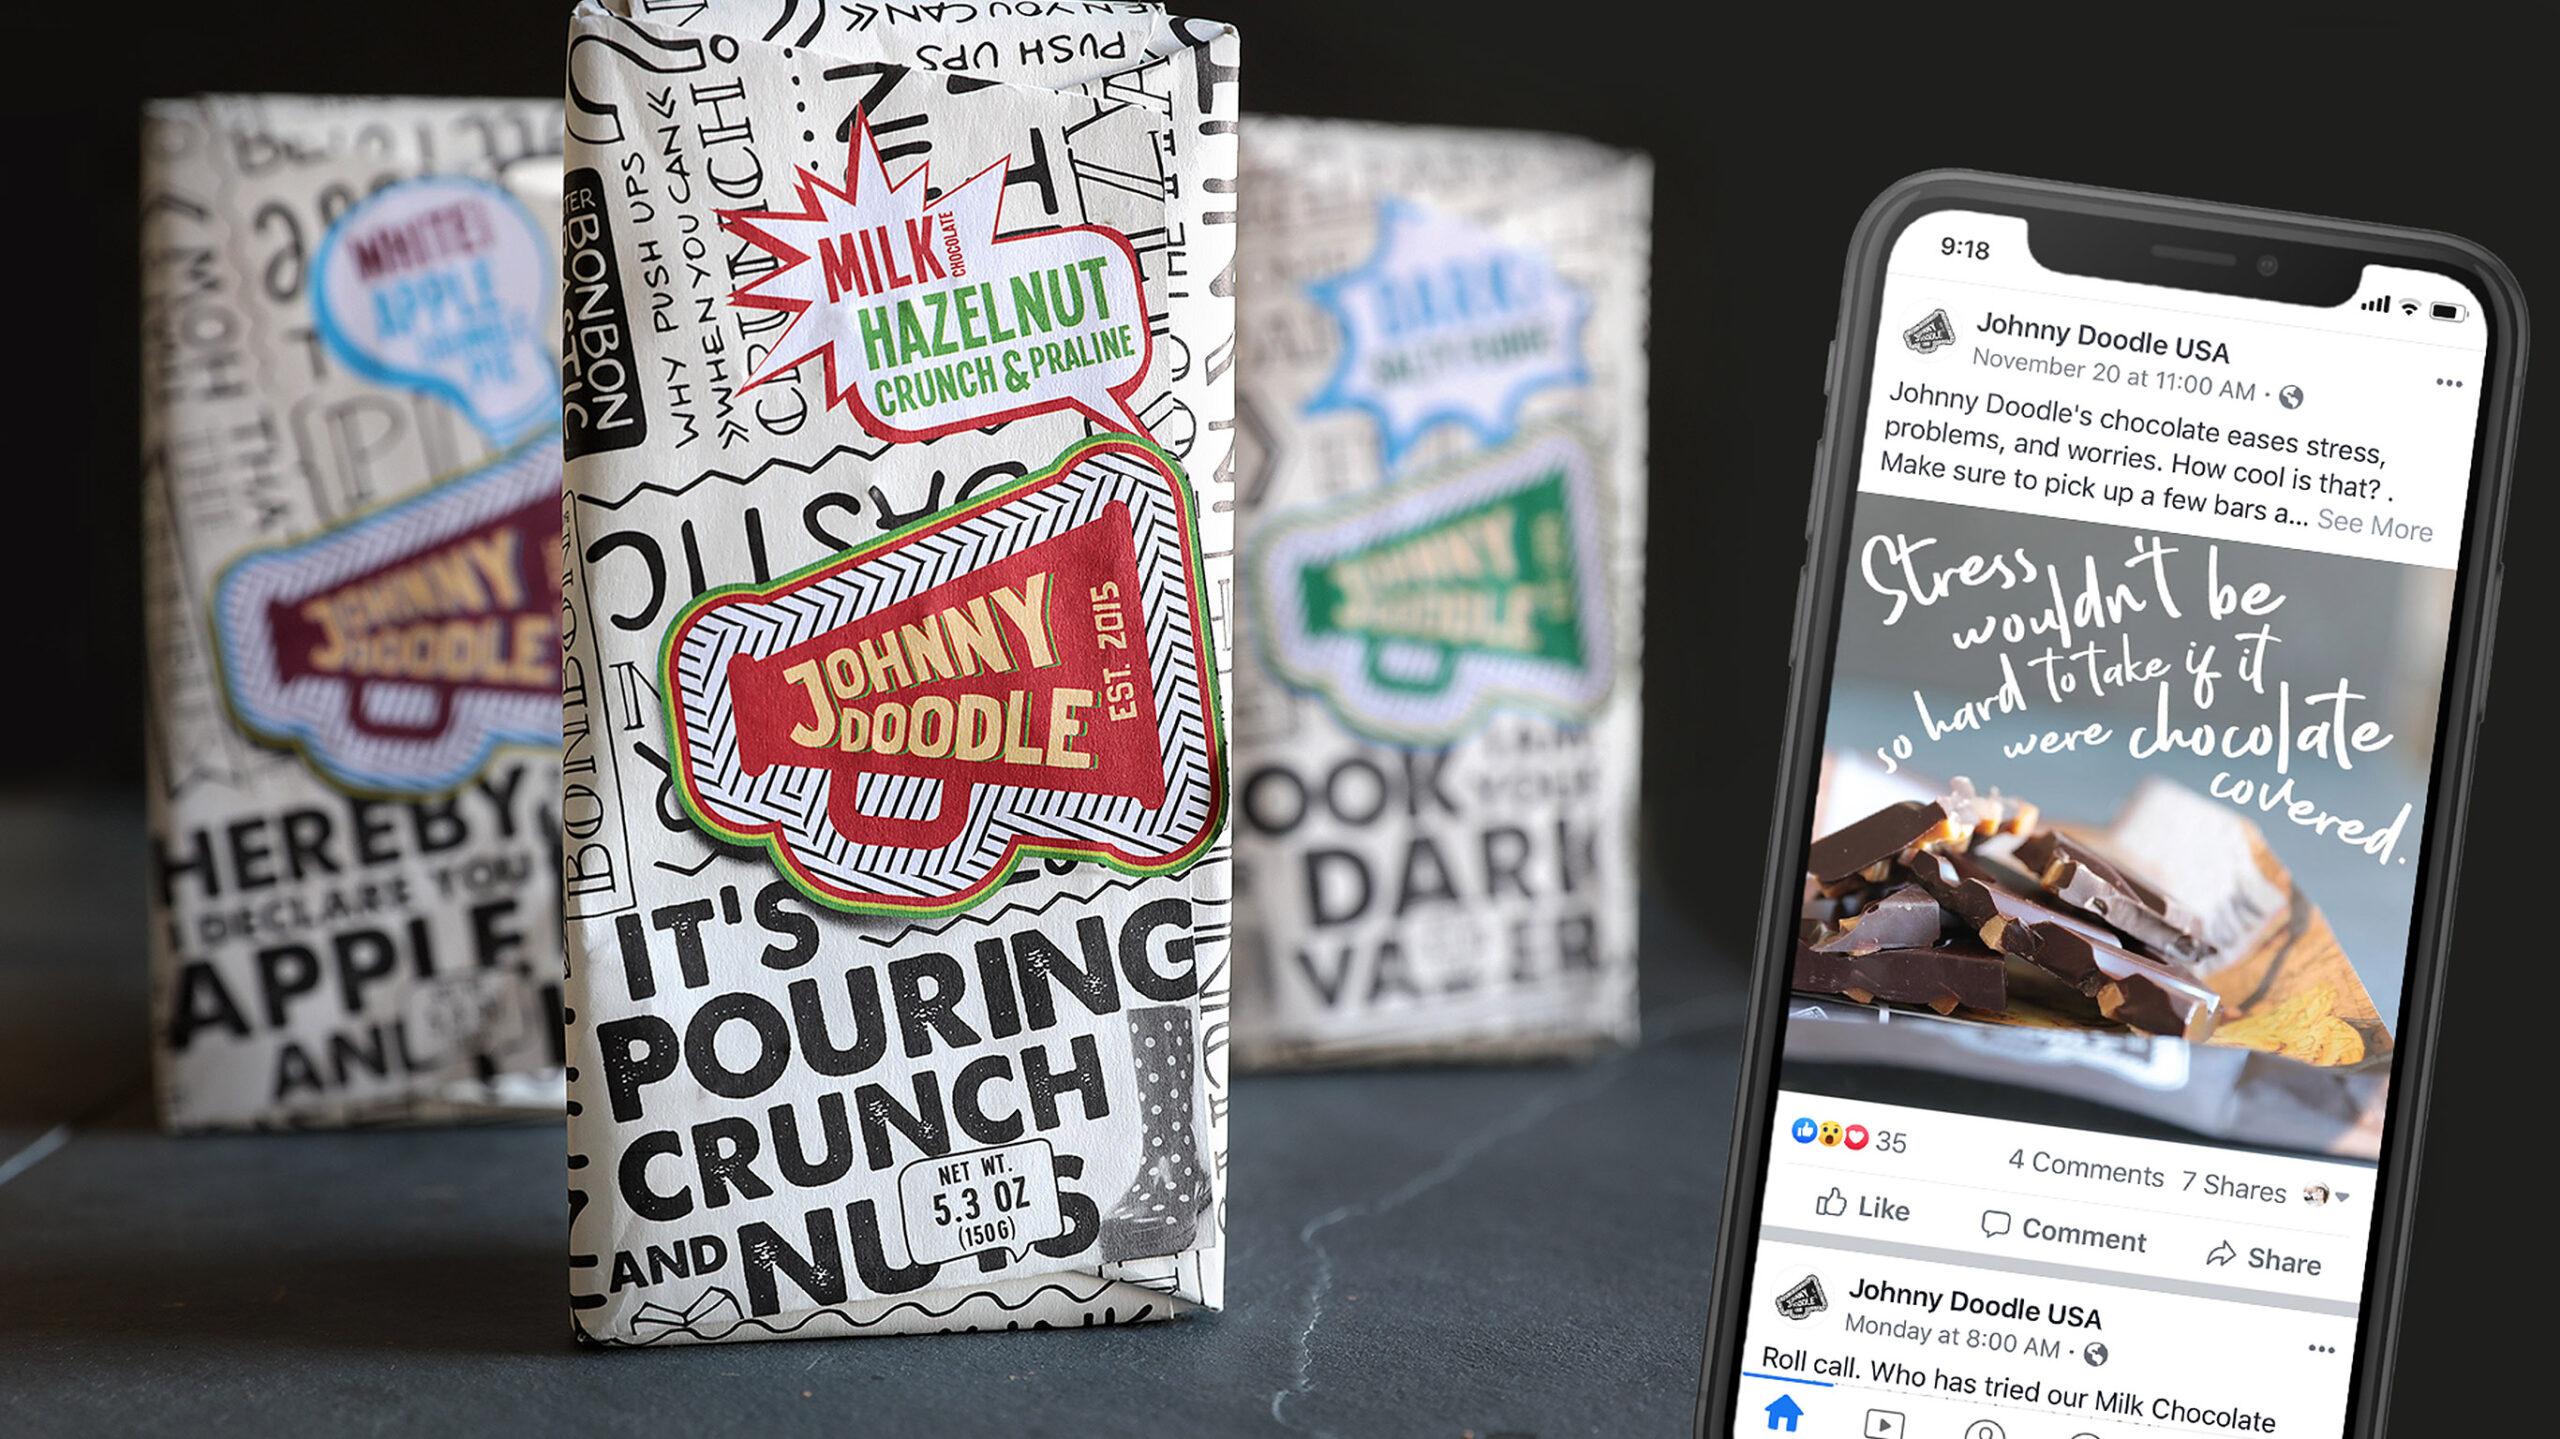 Johnny Doodle Chocolate Social Media